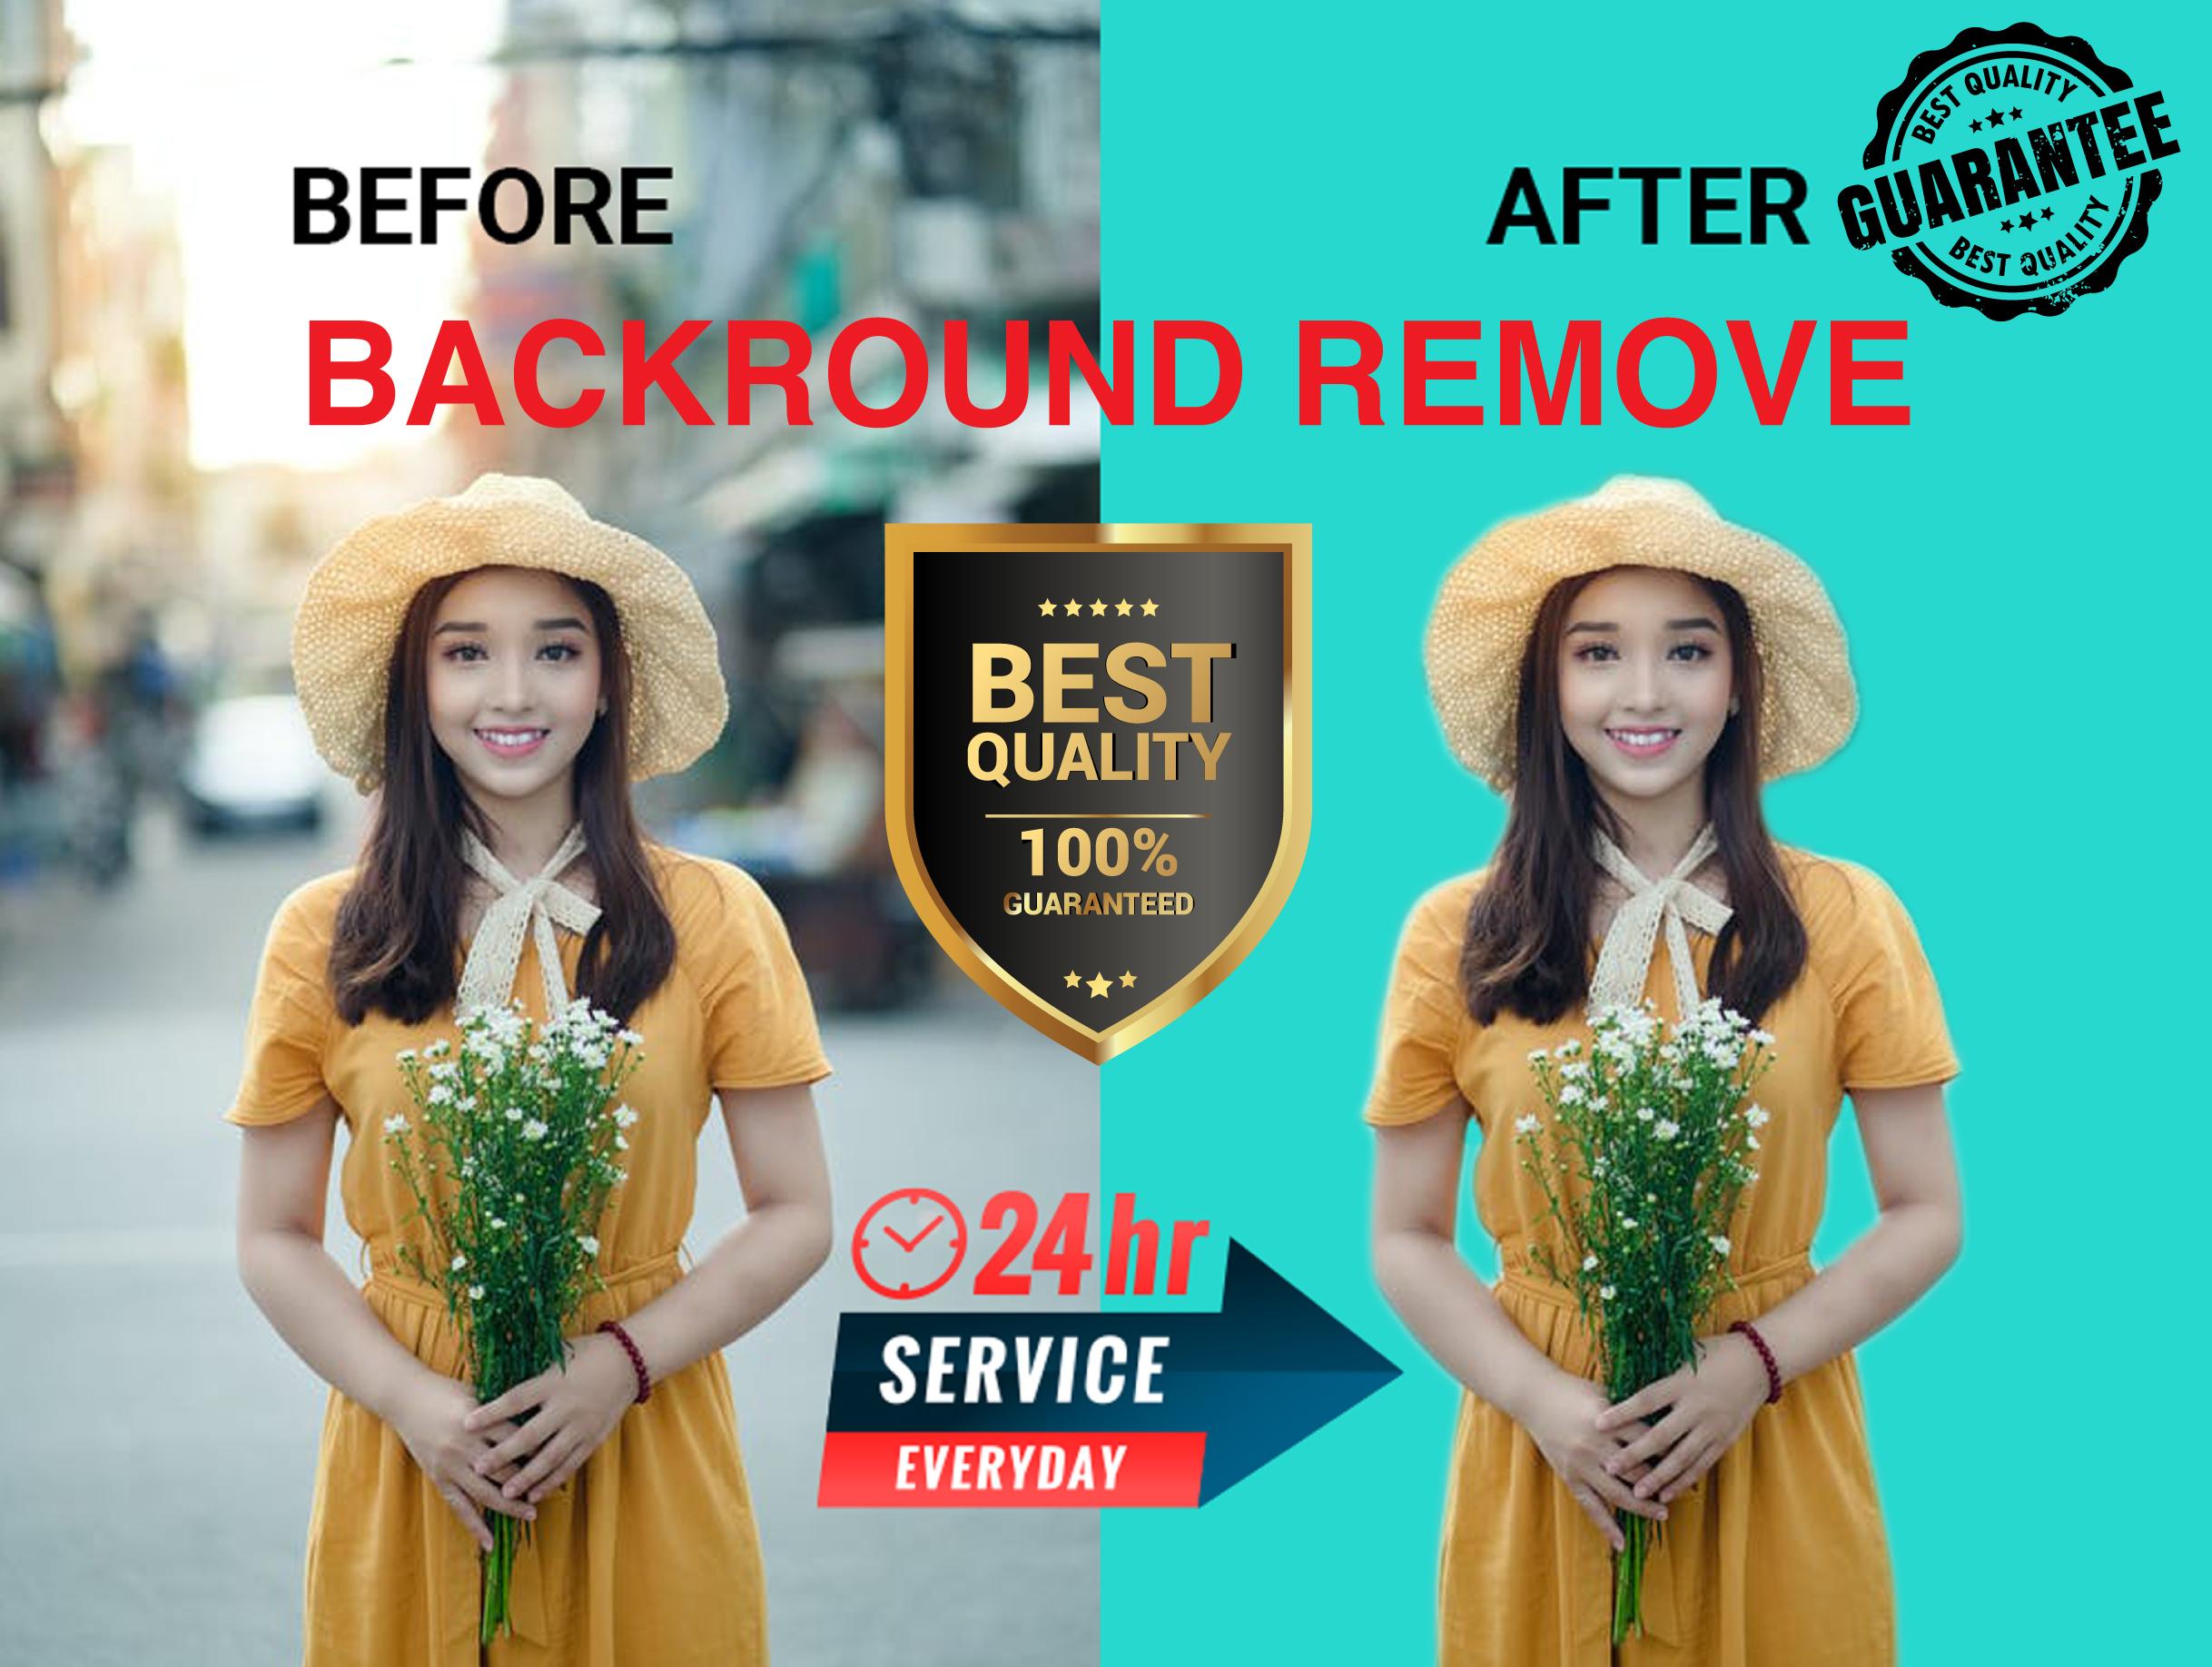 I will remove background amazon product photo editing change background cutout image